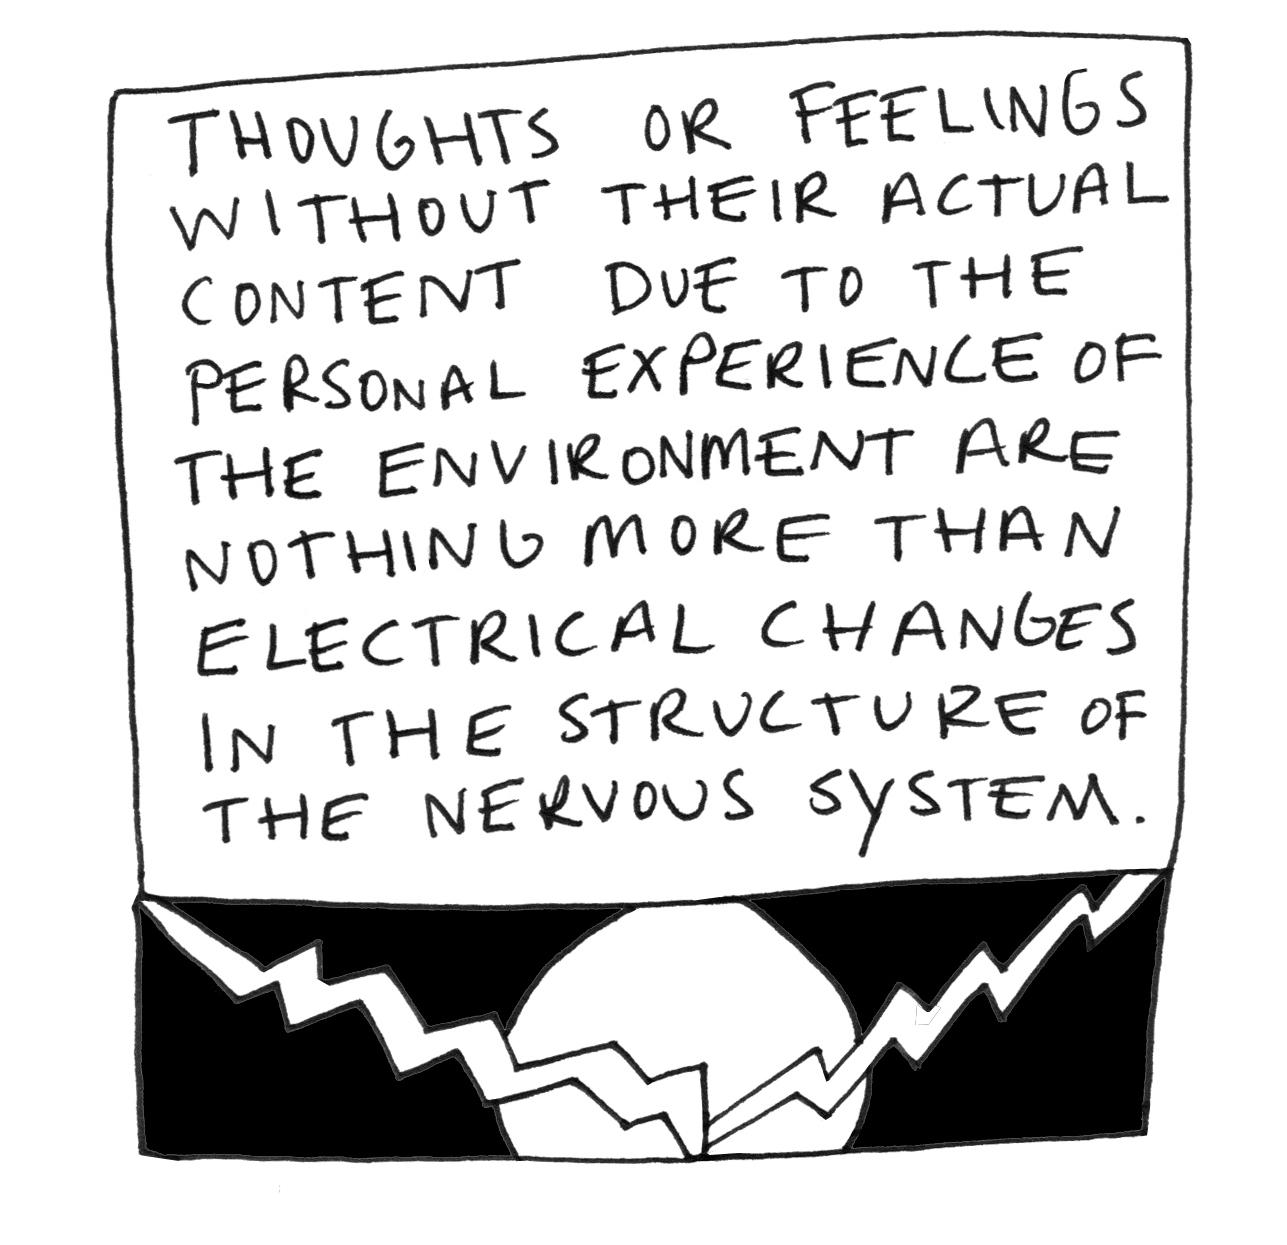 Thoughts or feelings filled - C bigger.jpg